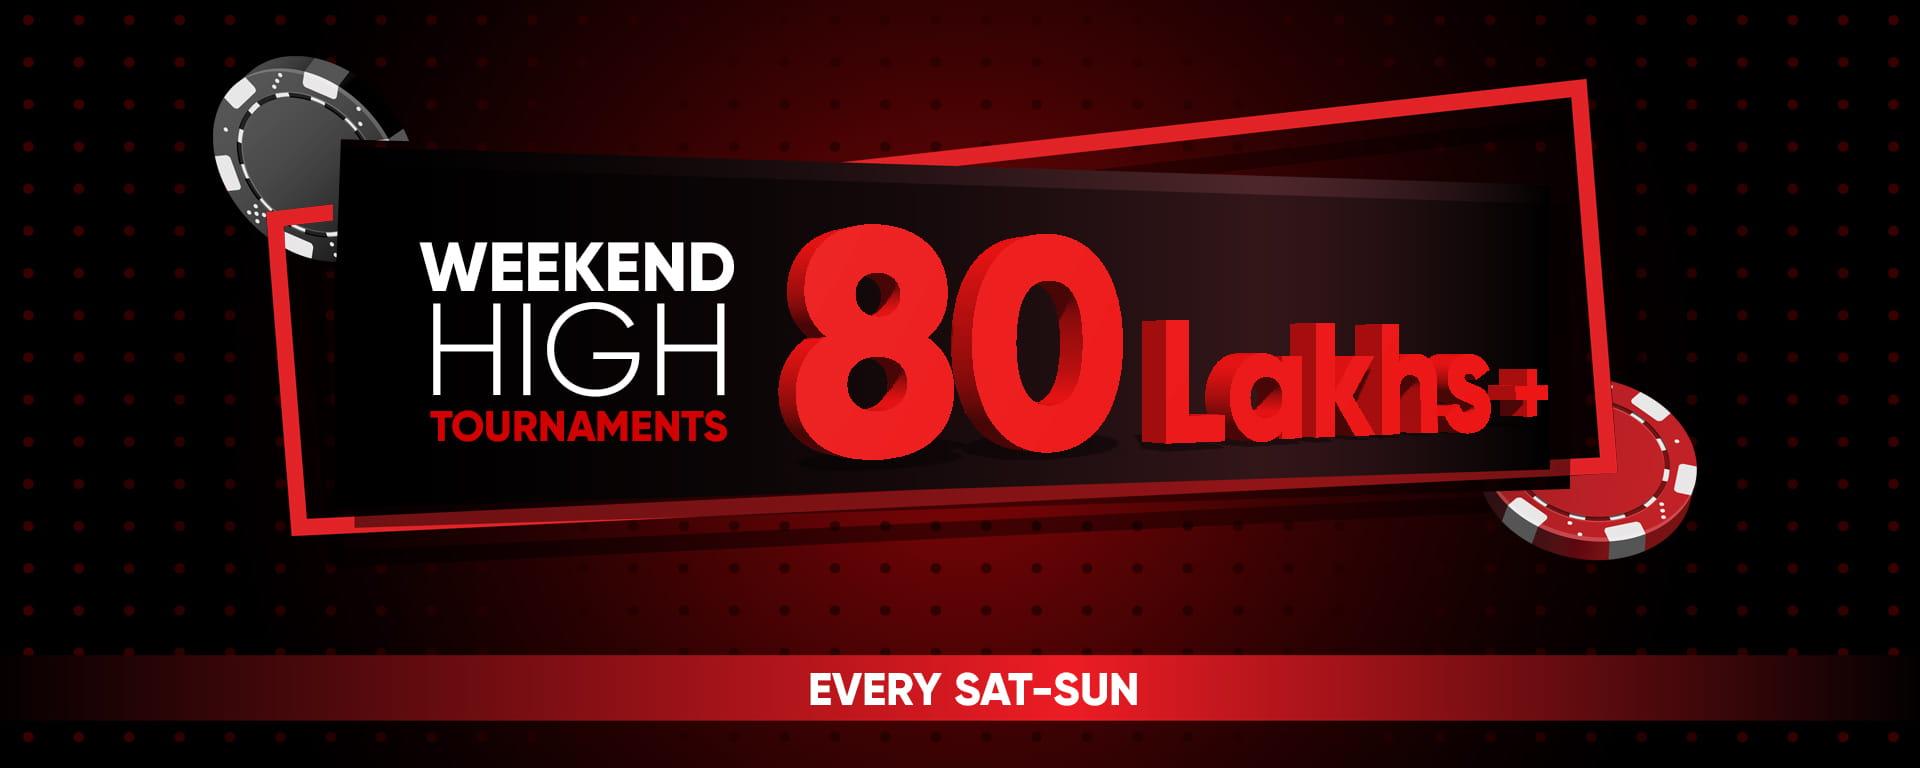 Weekend High Poker Tournaments